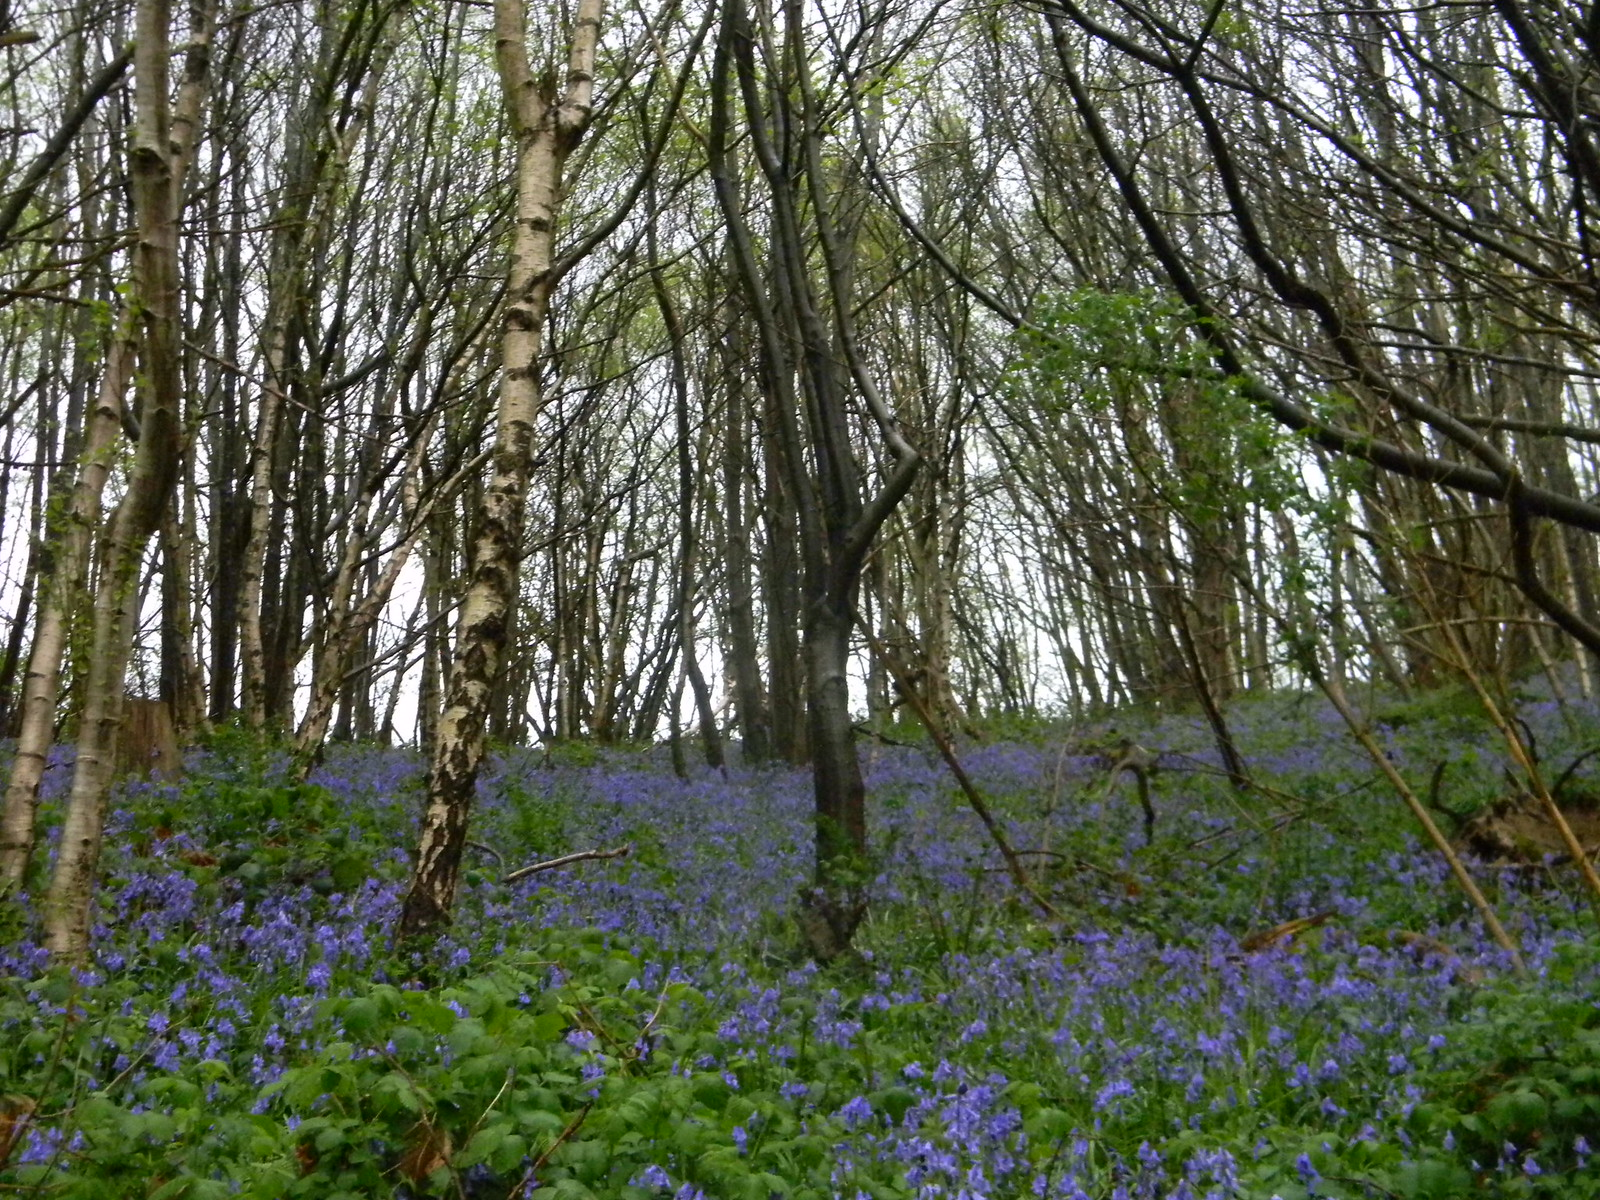 Bluebells Borough Green to Sevenoaks (composite walk)